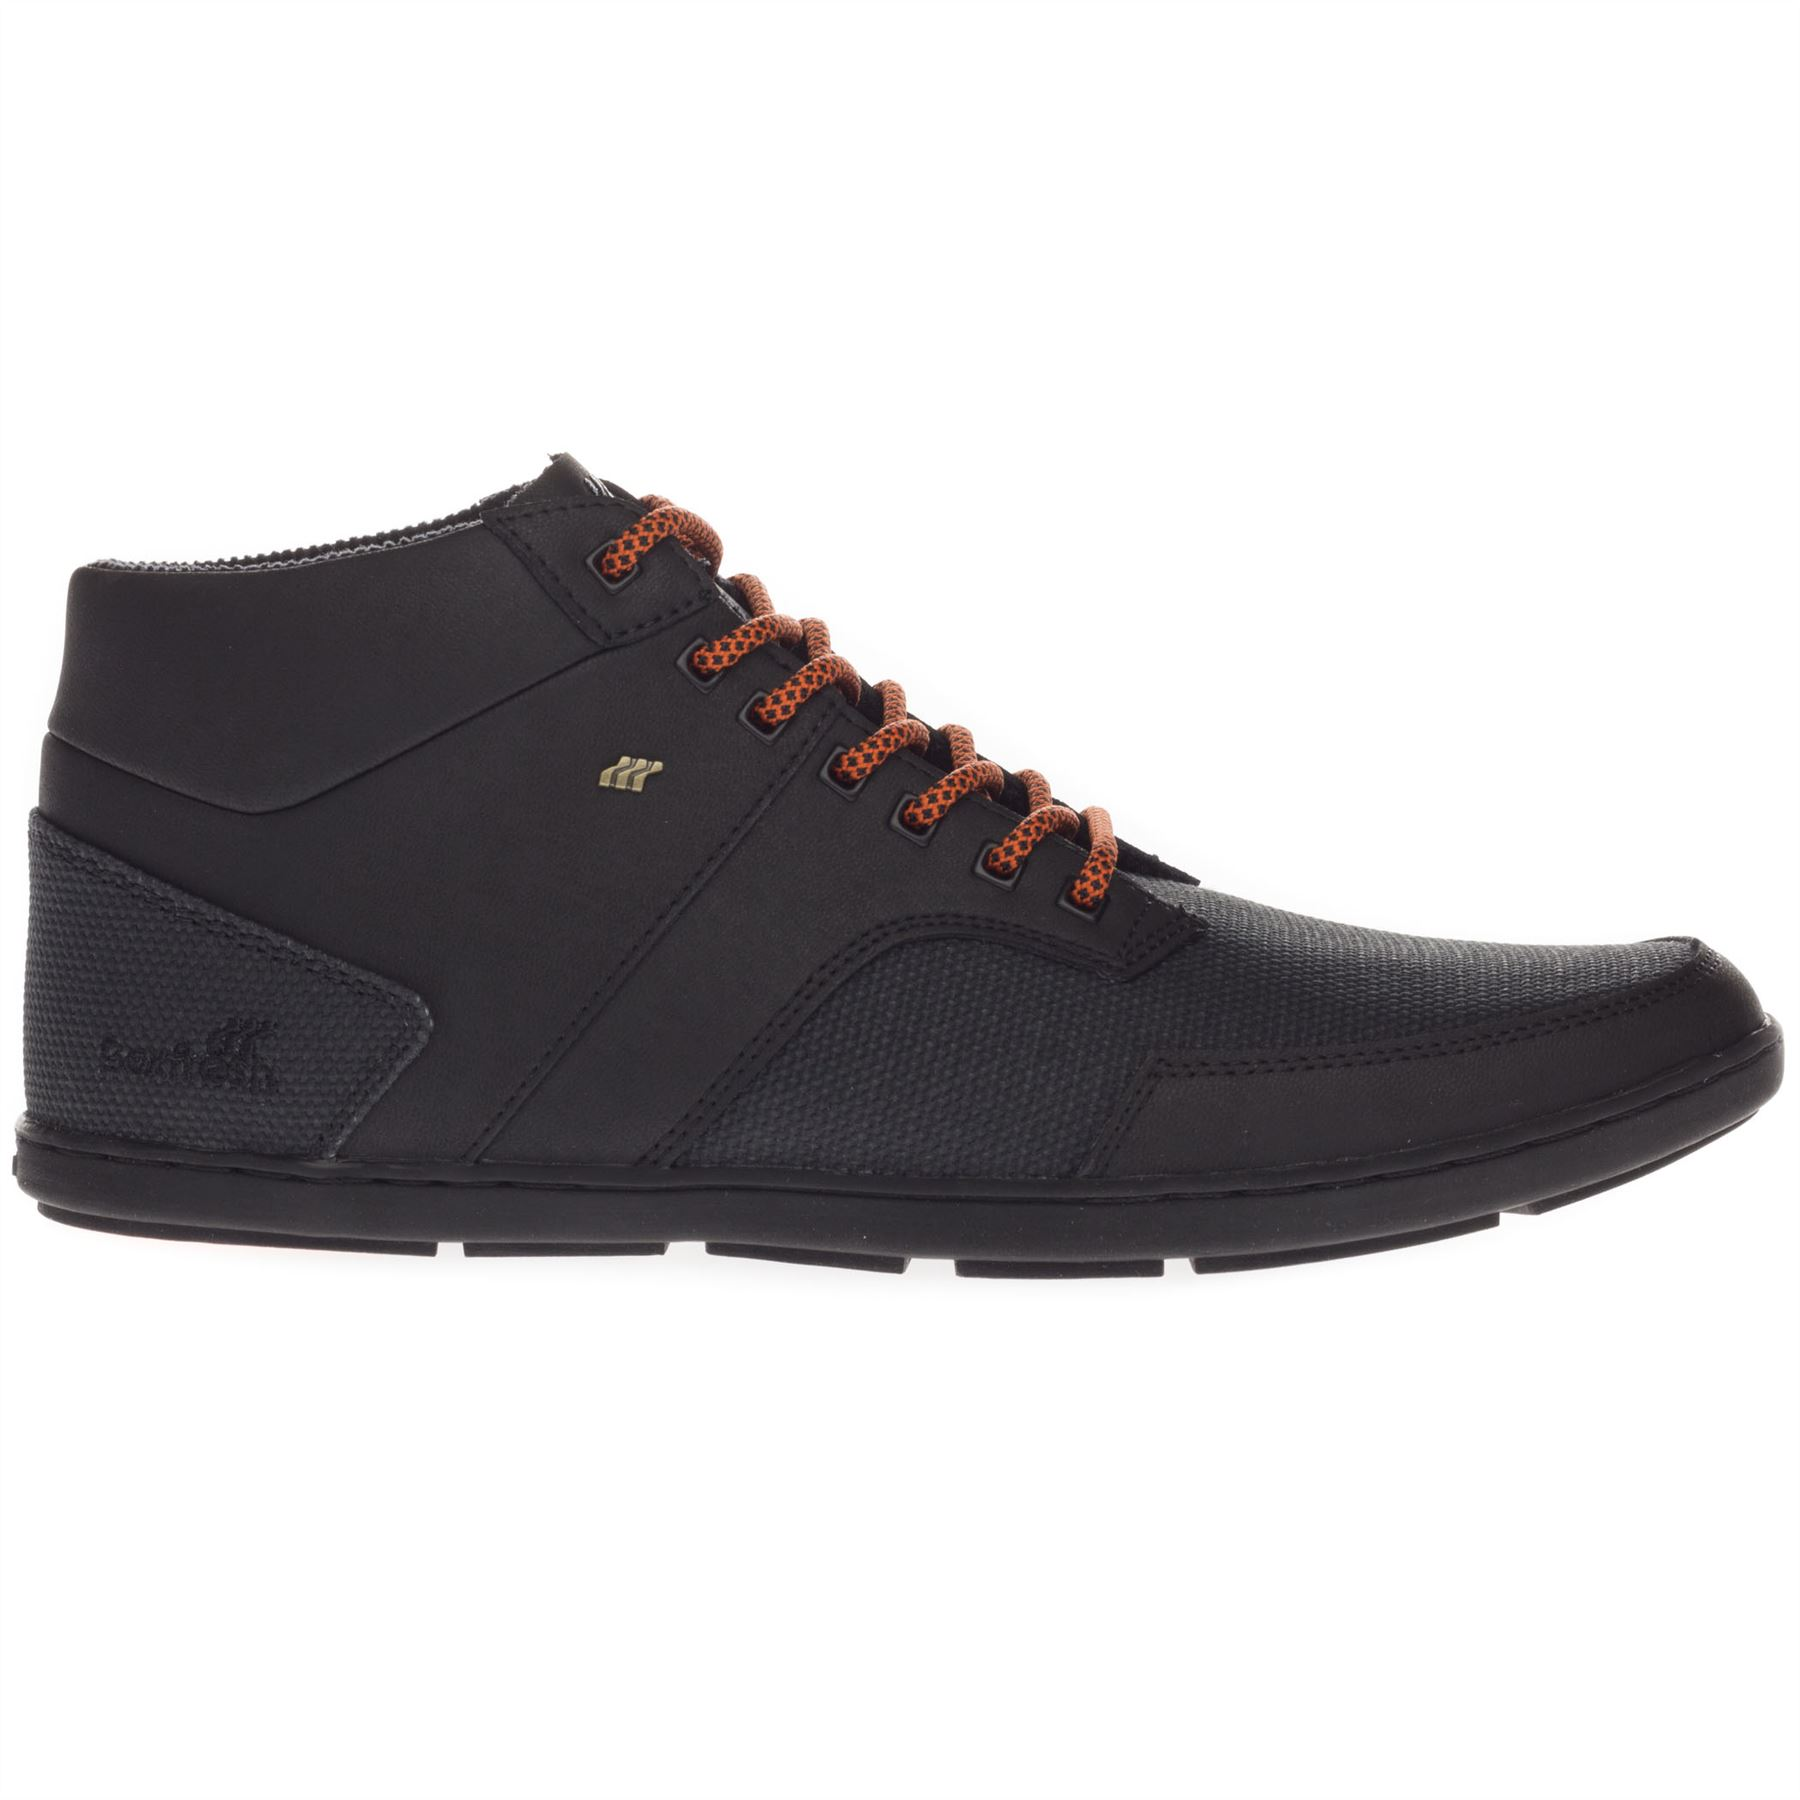 Boxfresh Men/'s Ampton Leather Hi Top Casual Strap Trainers Shoes Black Brown